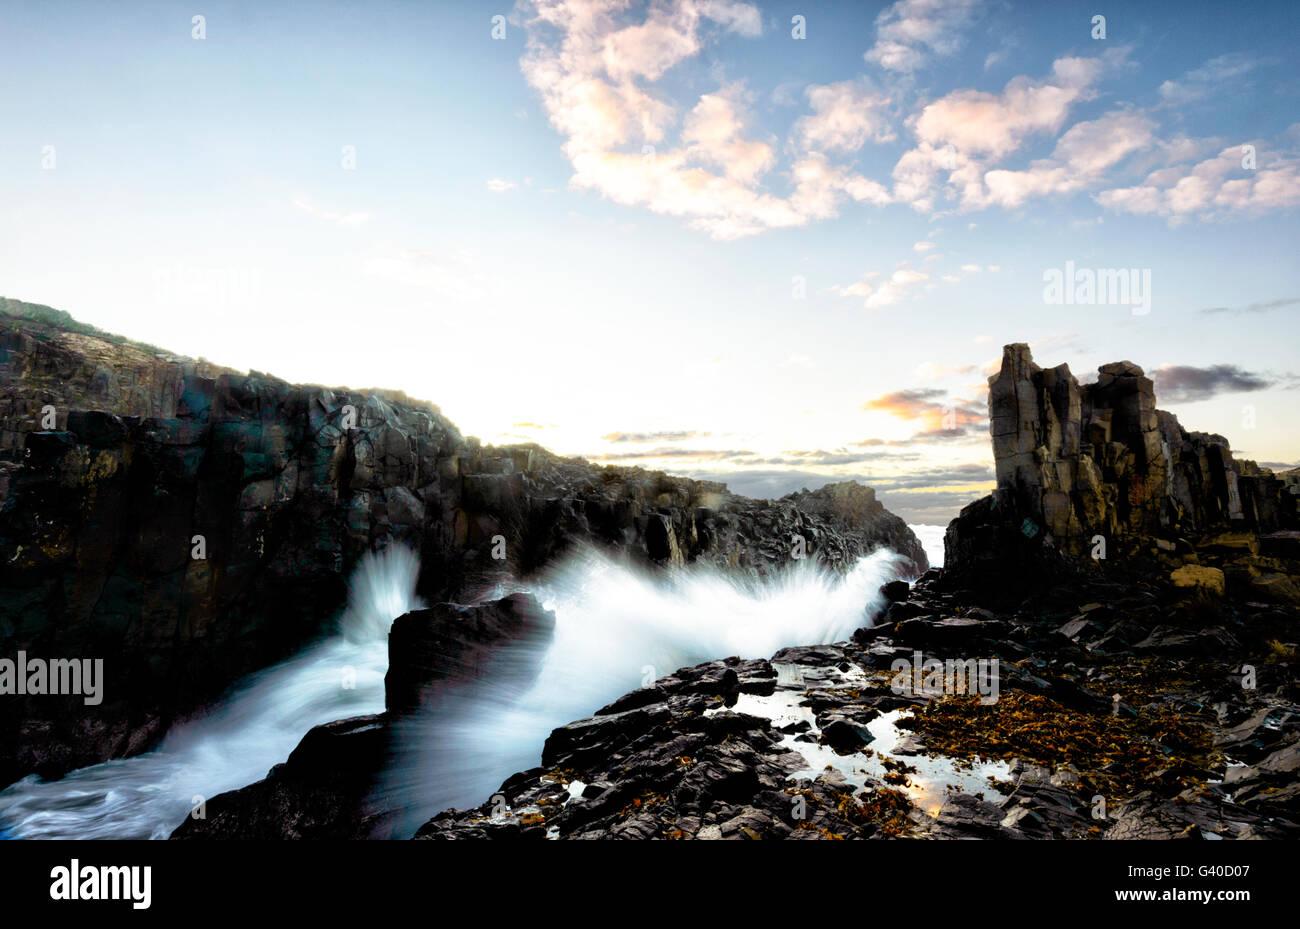 Motion blur at sunrise over Bombo Quarry Headland, Kiama, Illawarra Coast, New South Wales, NSW, Australia - Stock Image